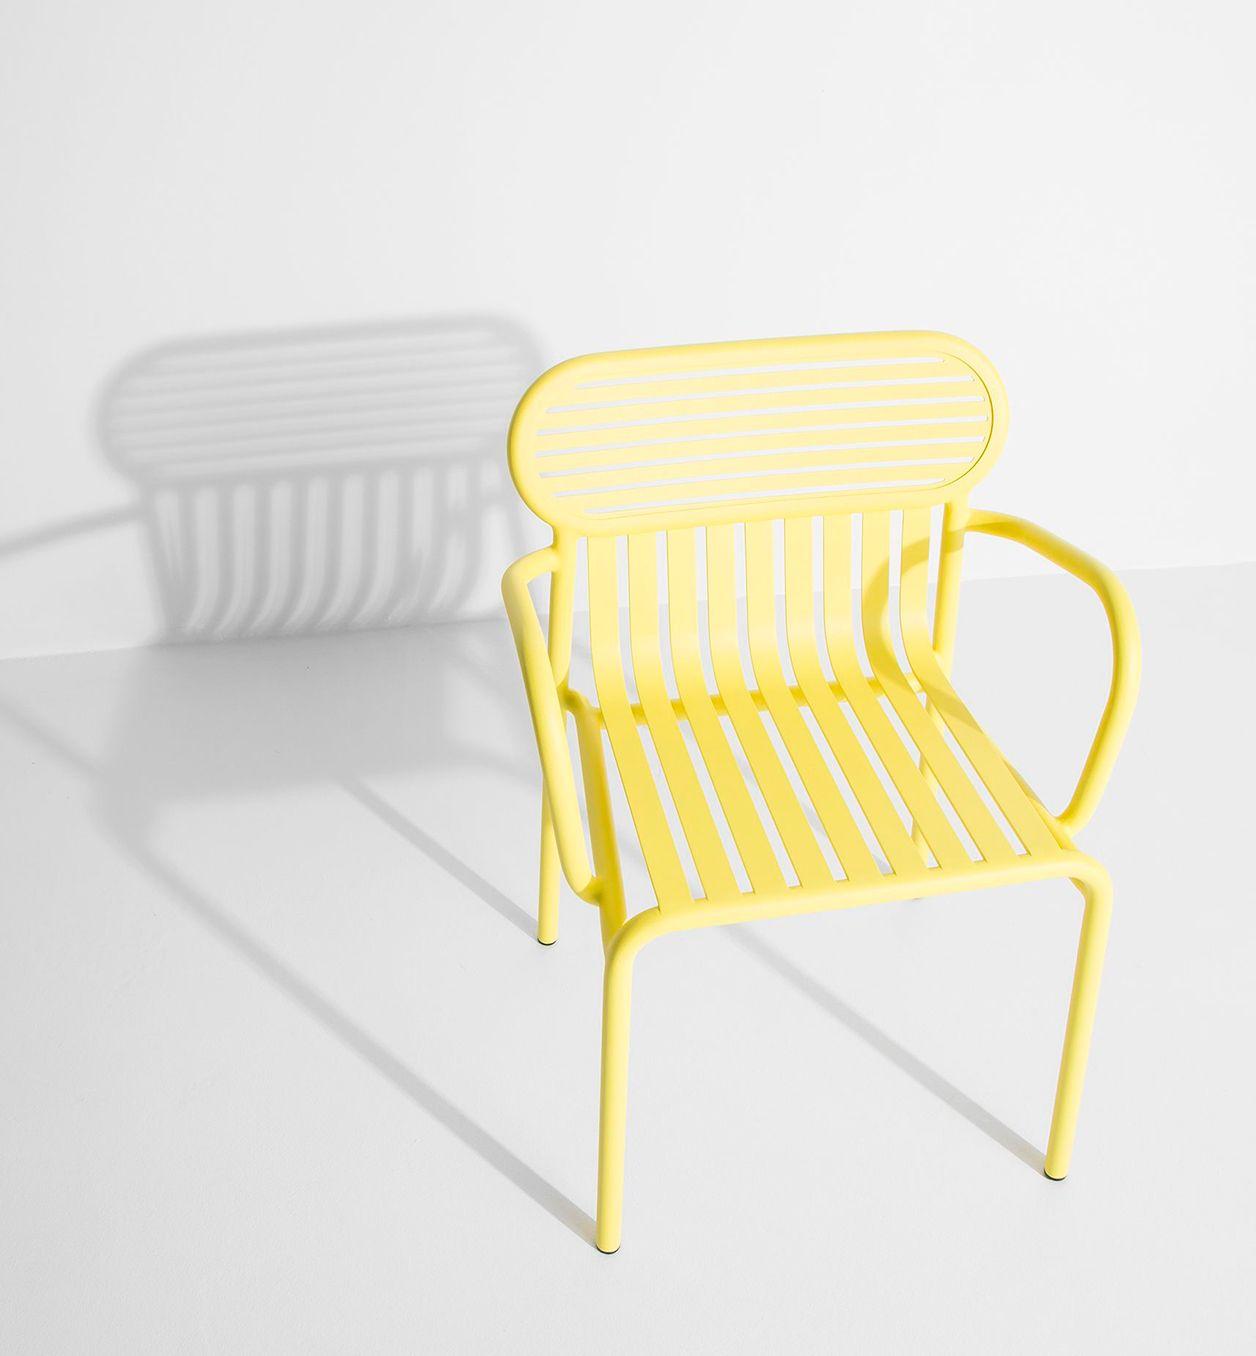 Garden furniture - Petite Friture